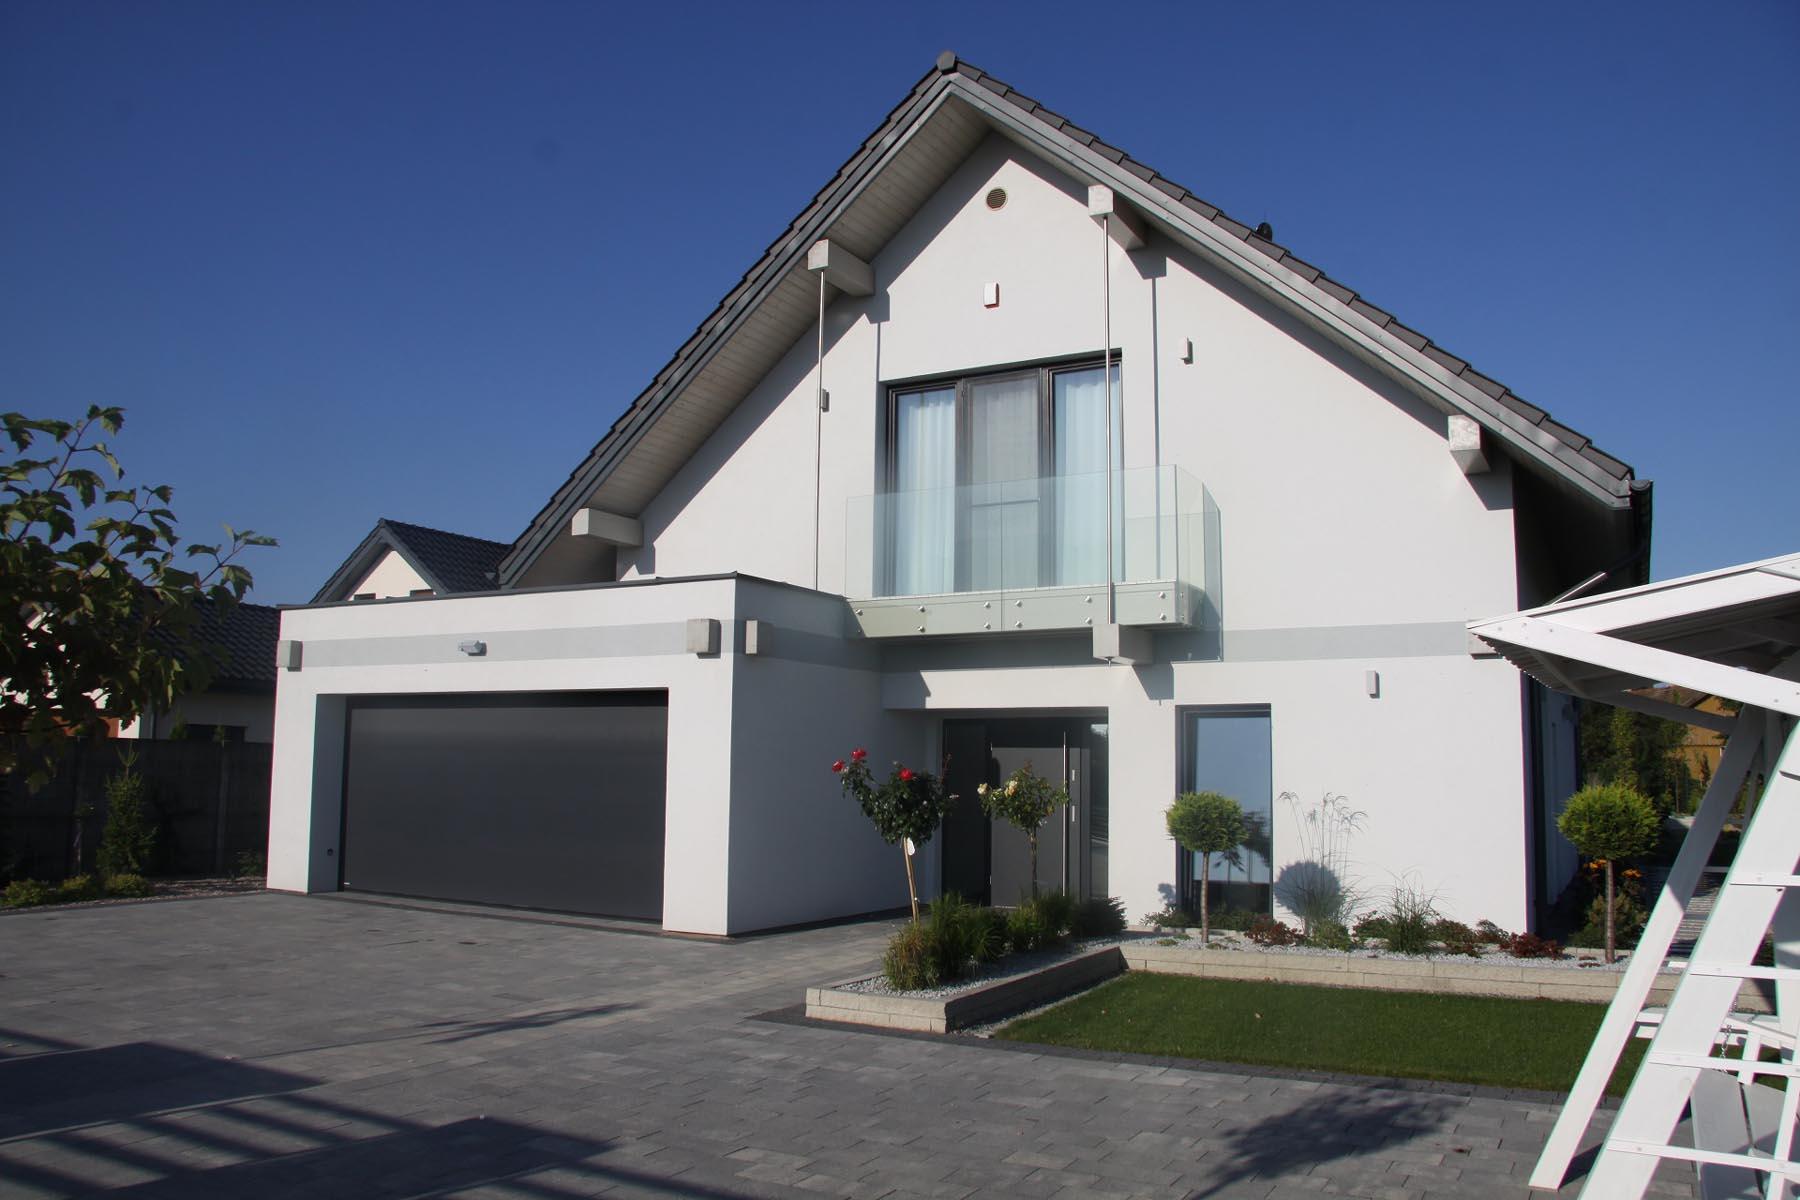 projekt-domu-otwarty-4-fot-12-1477055686-6ikc7cir.jpg